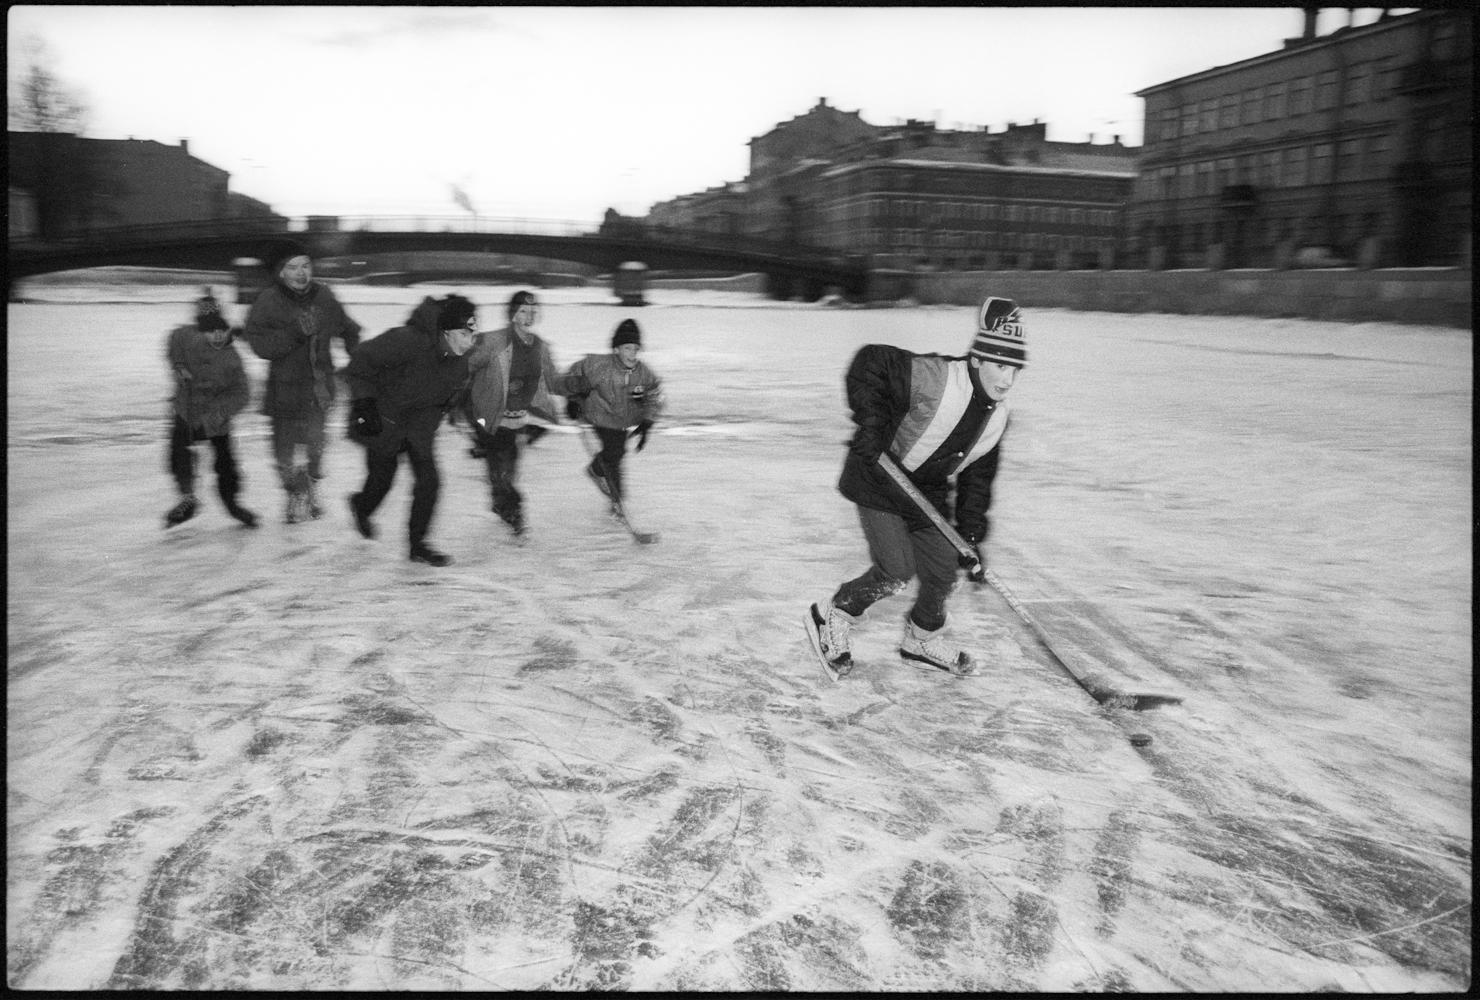 hockey_edit-1.jpg